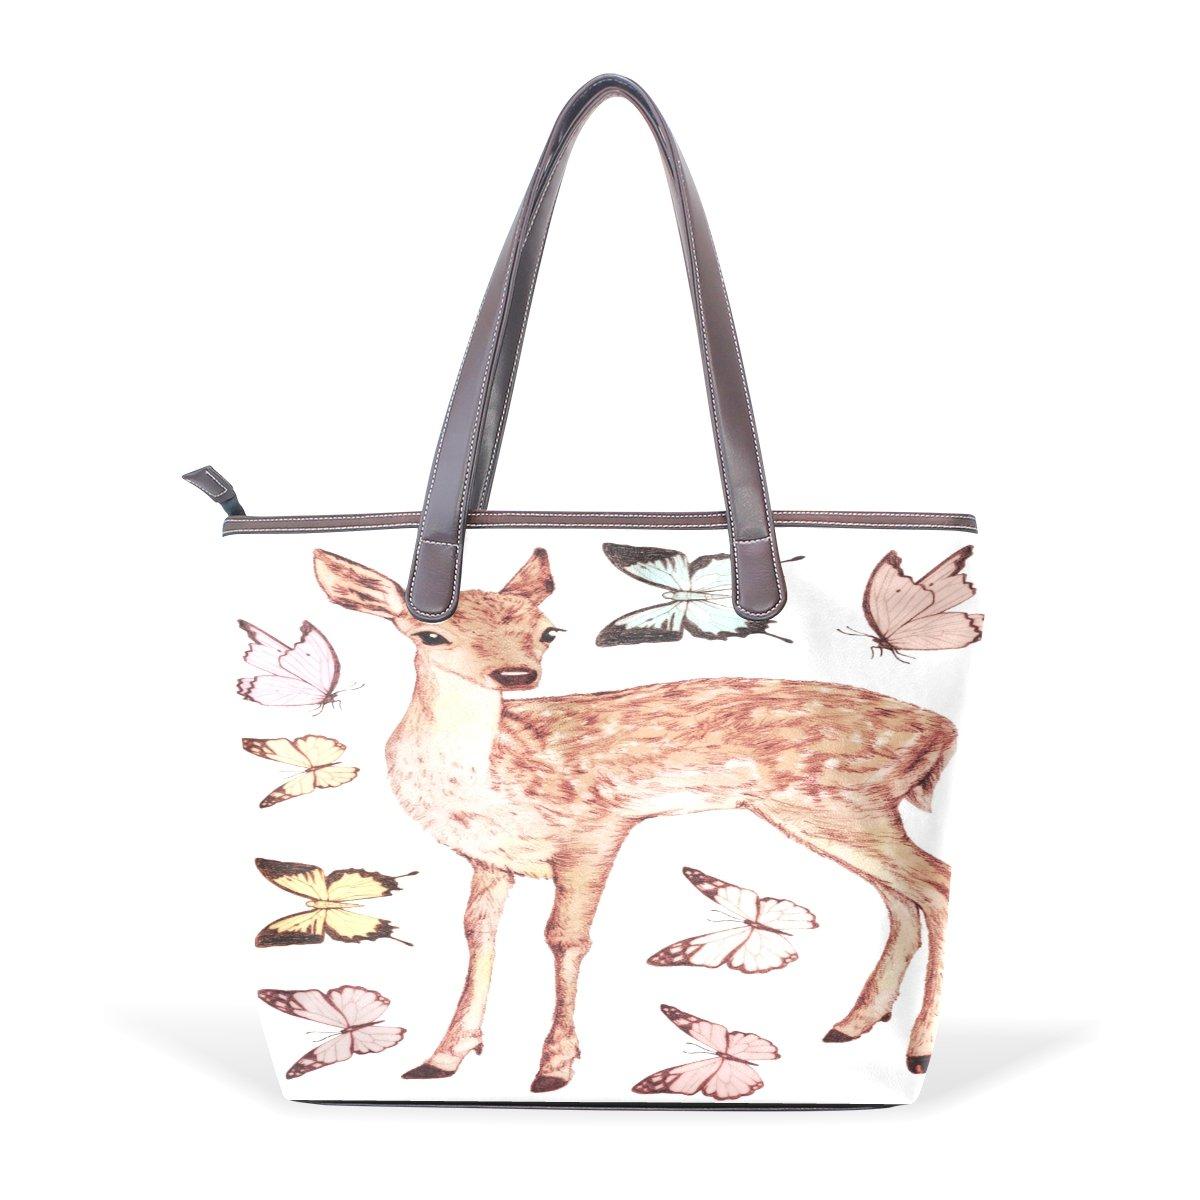 SCDS Butterfly And Deer PU Leather Lady Handbag Tote Bag Zipper Shoulder Bag